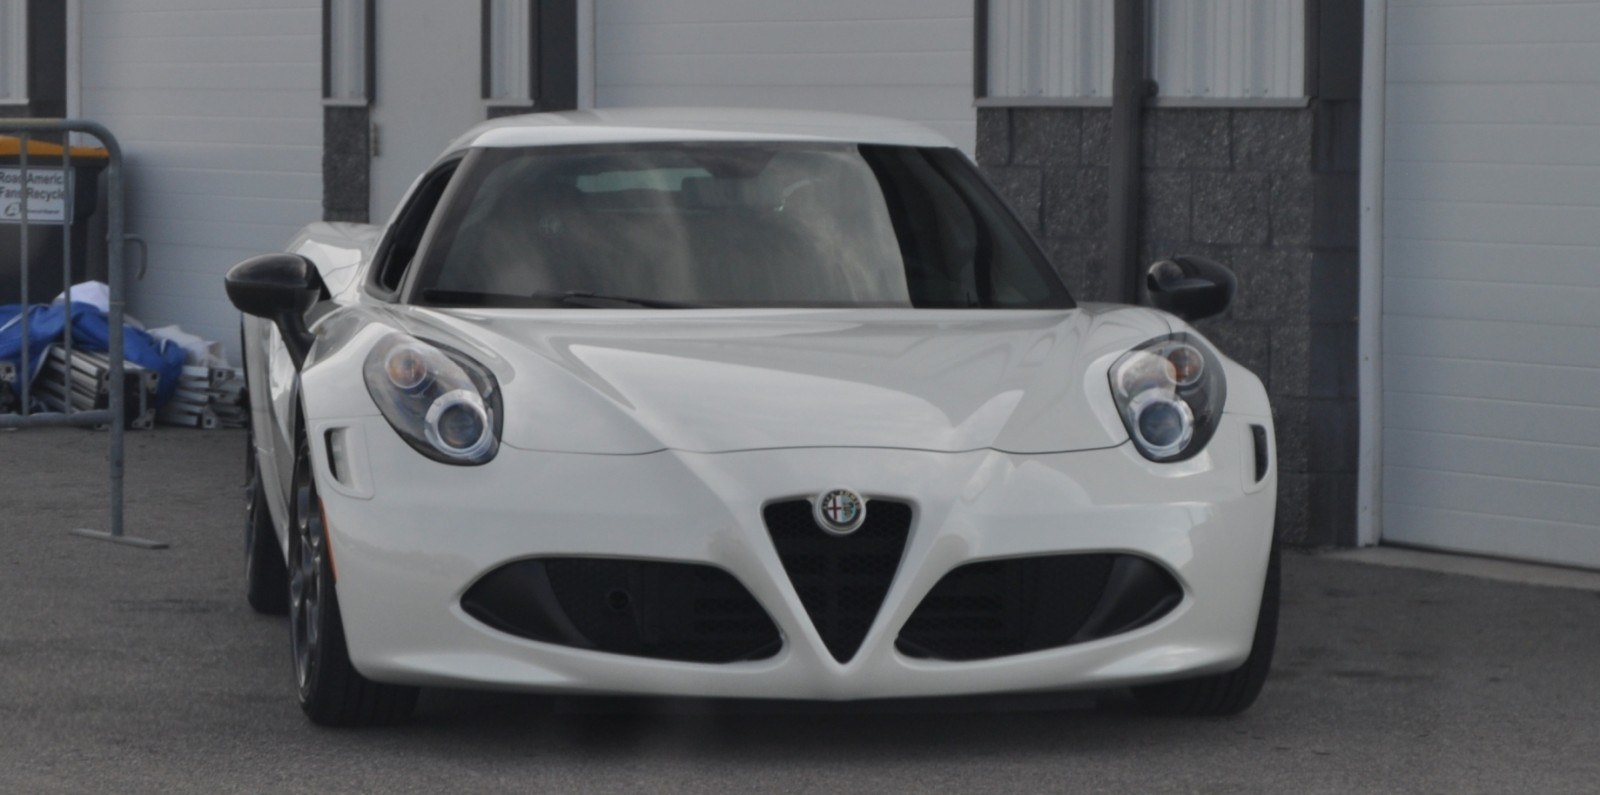 Gorgeous 2015 Alfa-Romeo 4C Revealed in Full USA Trim + New Headlights! 27